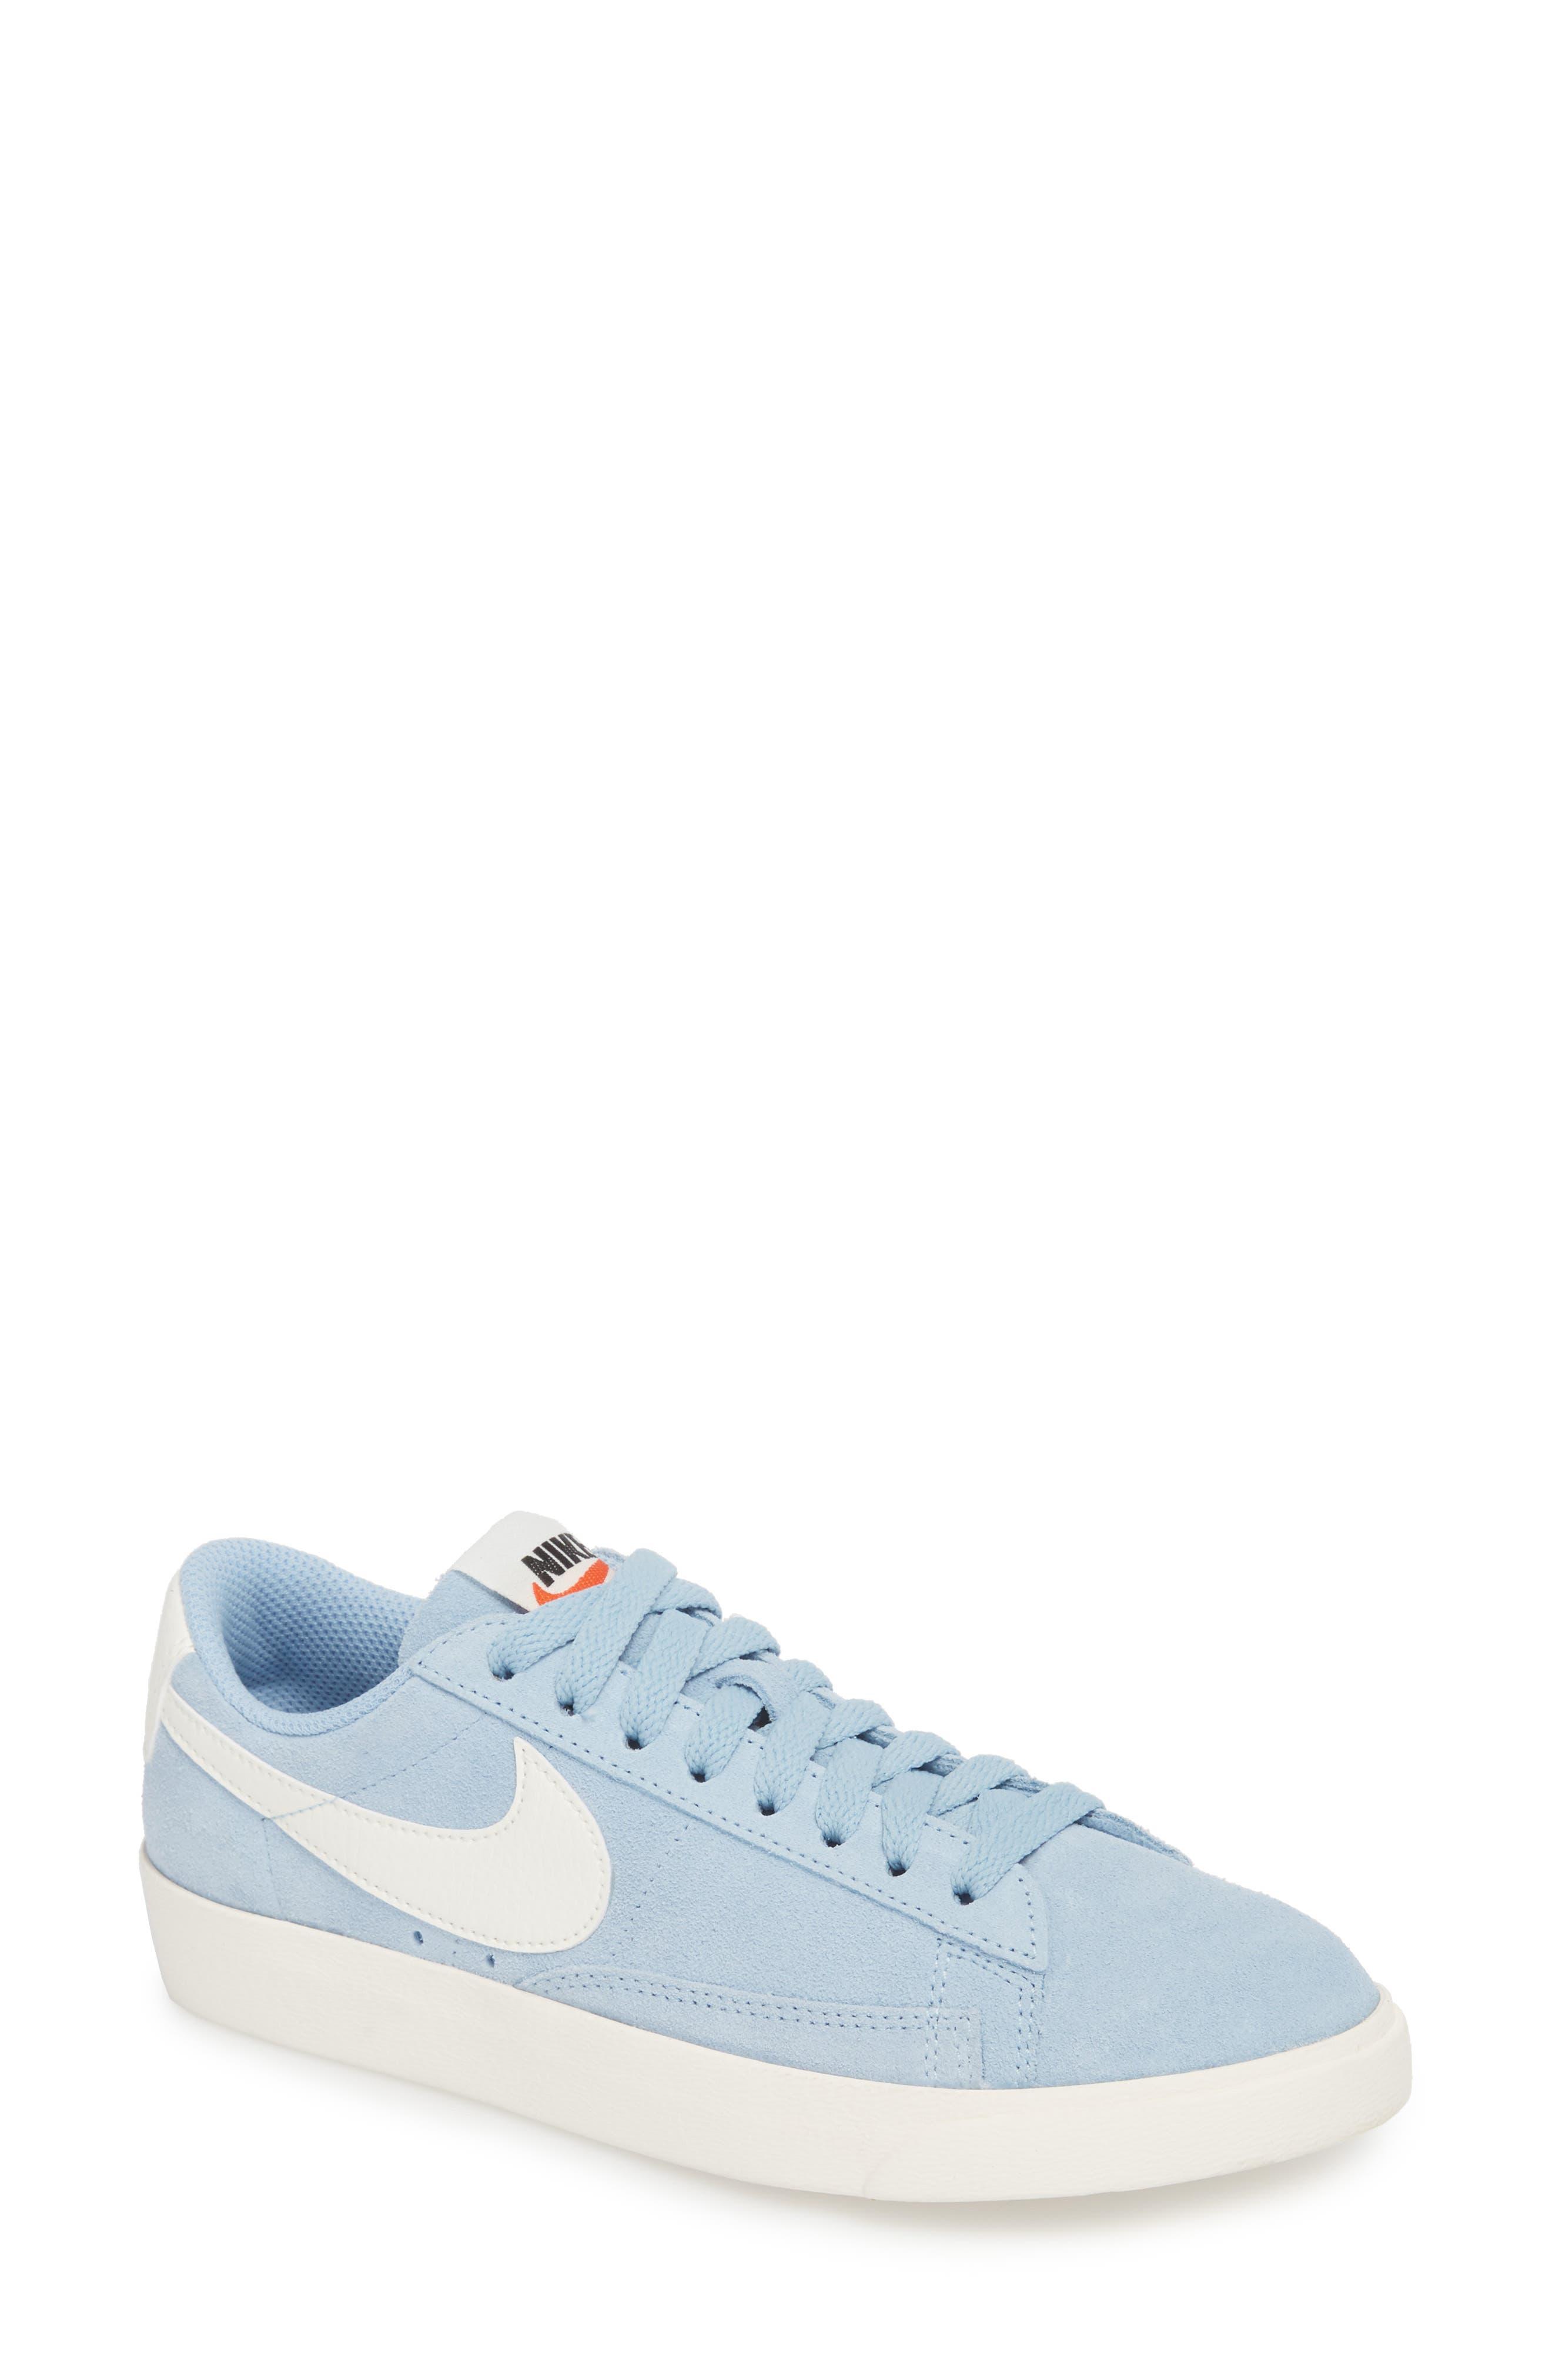 Alternate Image 1 Selected - Nike Blazer Low Sneaker (Women)